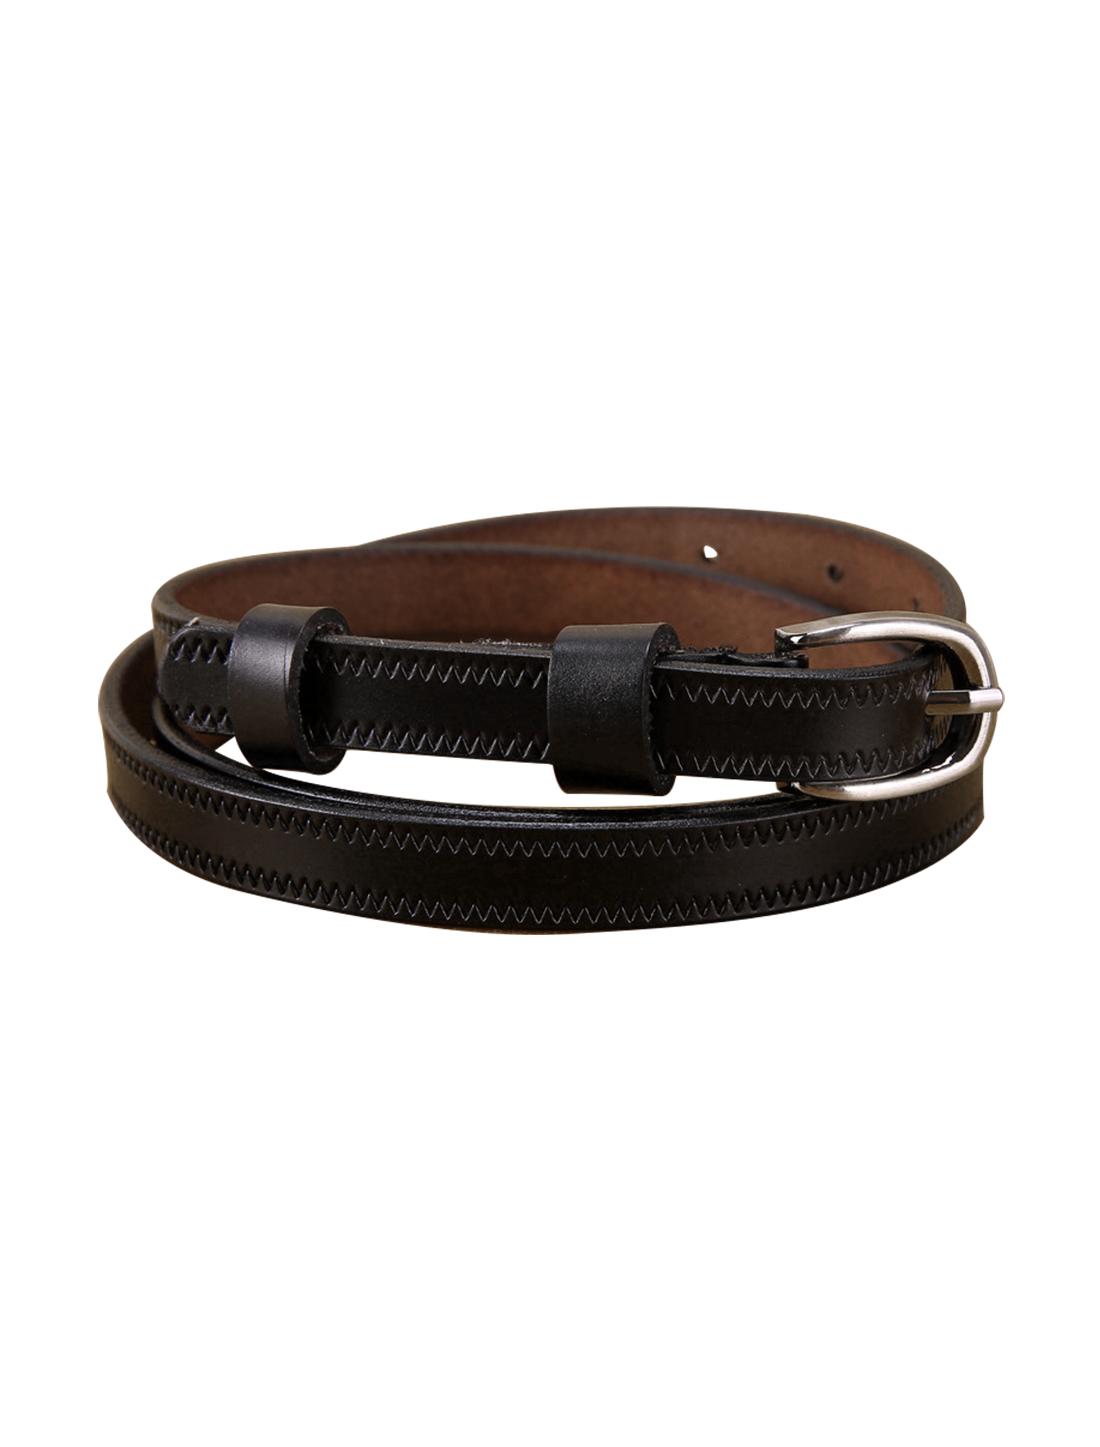 "Women Embossed Stitching Single Pin Buckle Leather Thin Belt Width 1/2"" Black"